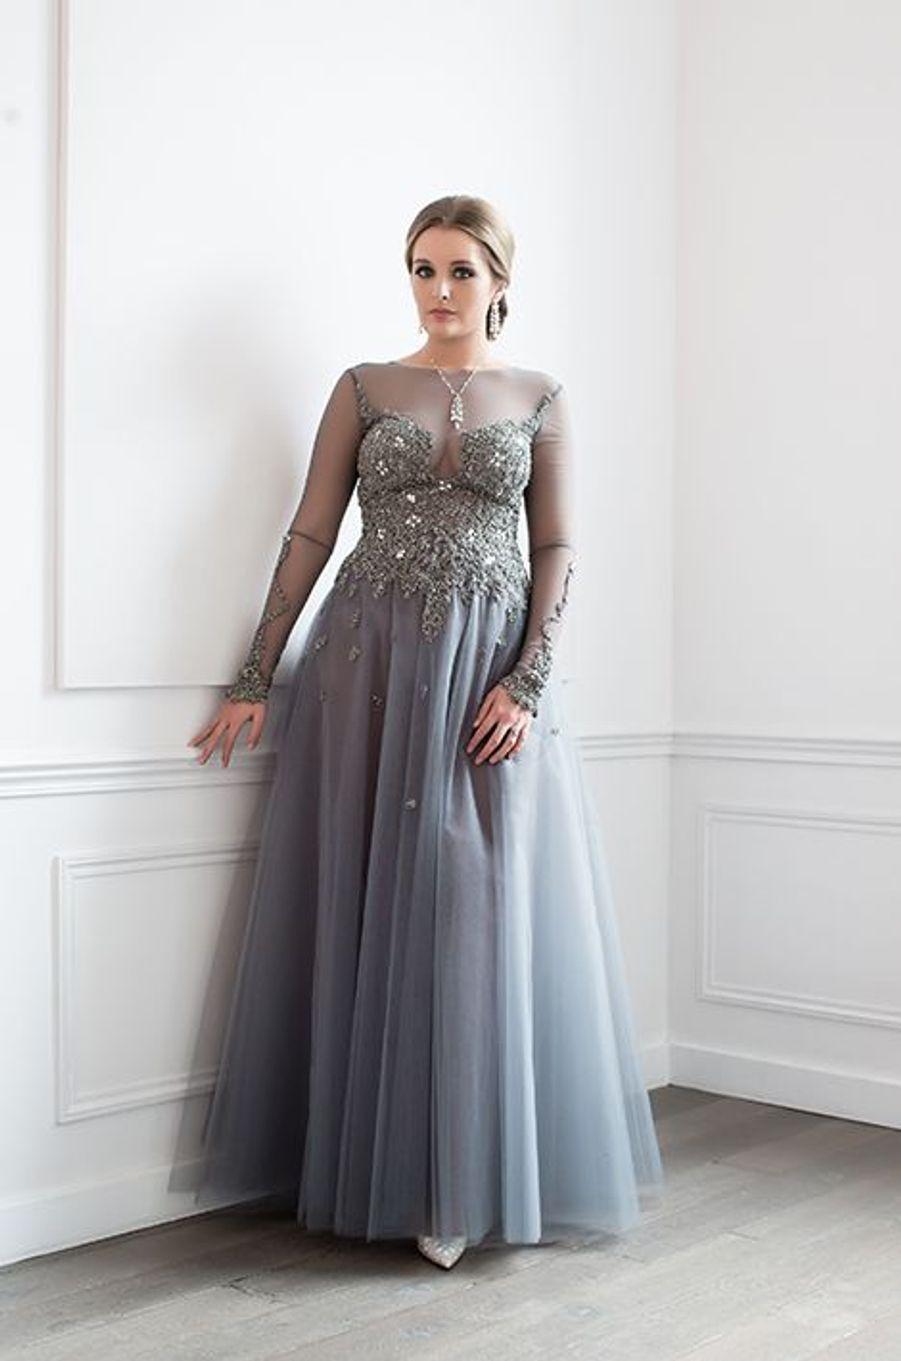 Zofia Krasicki v Siecin (Australie) en robe Oglia-Loro, bijoux Payal New York